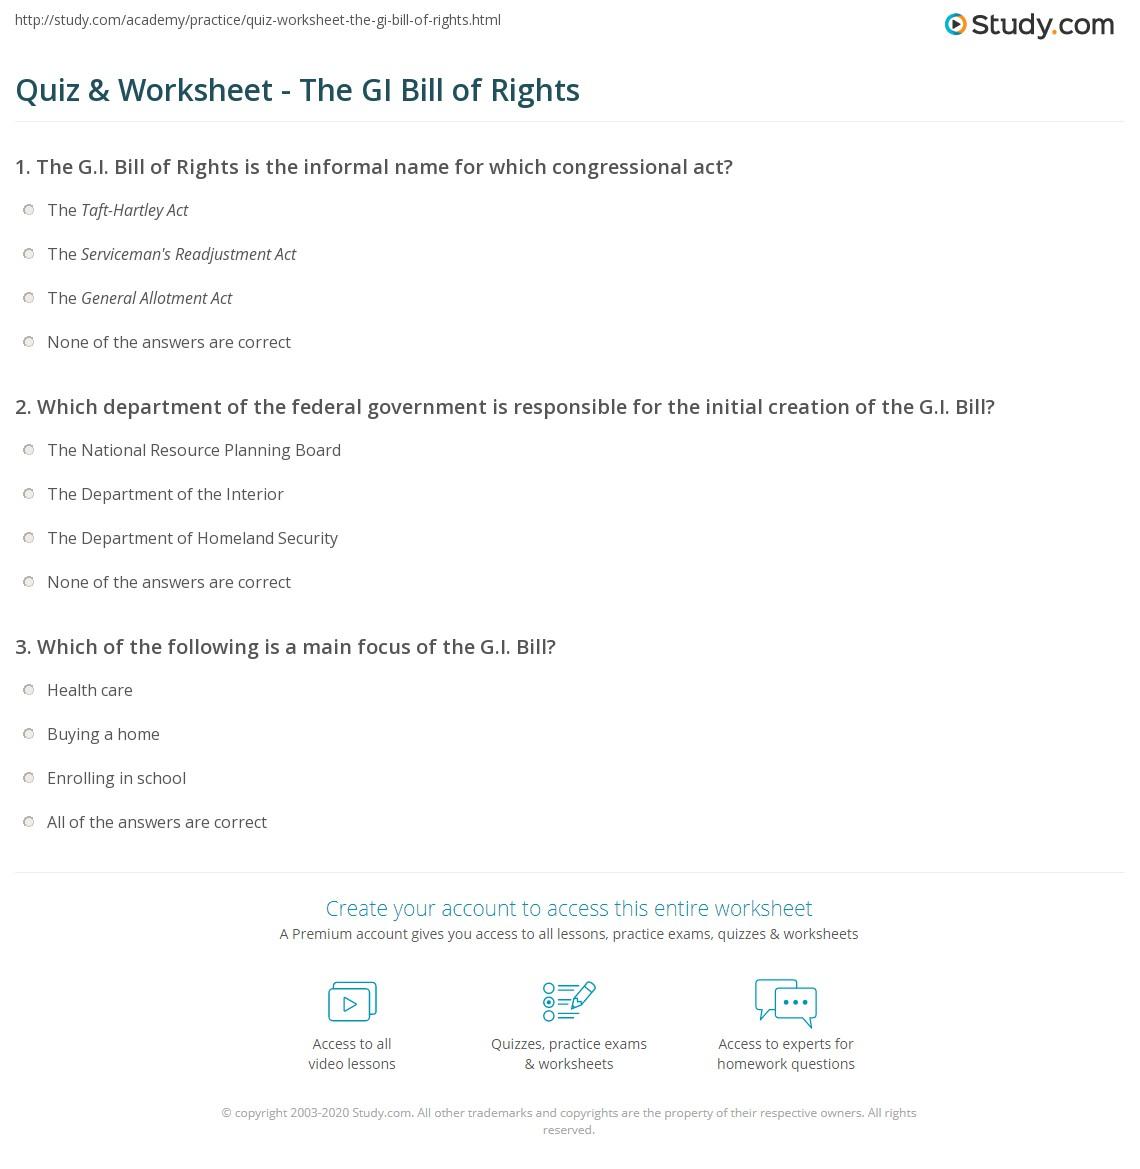 Worksheets Bill Of Rights Worksheets quiz worksheet the gi bill of rights study com print definition benefits worksheet